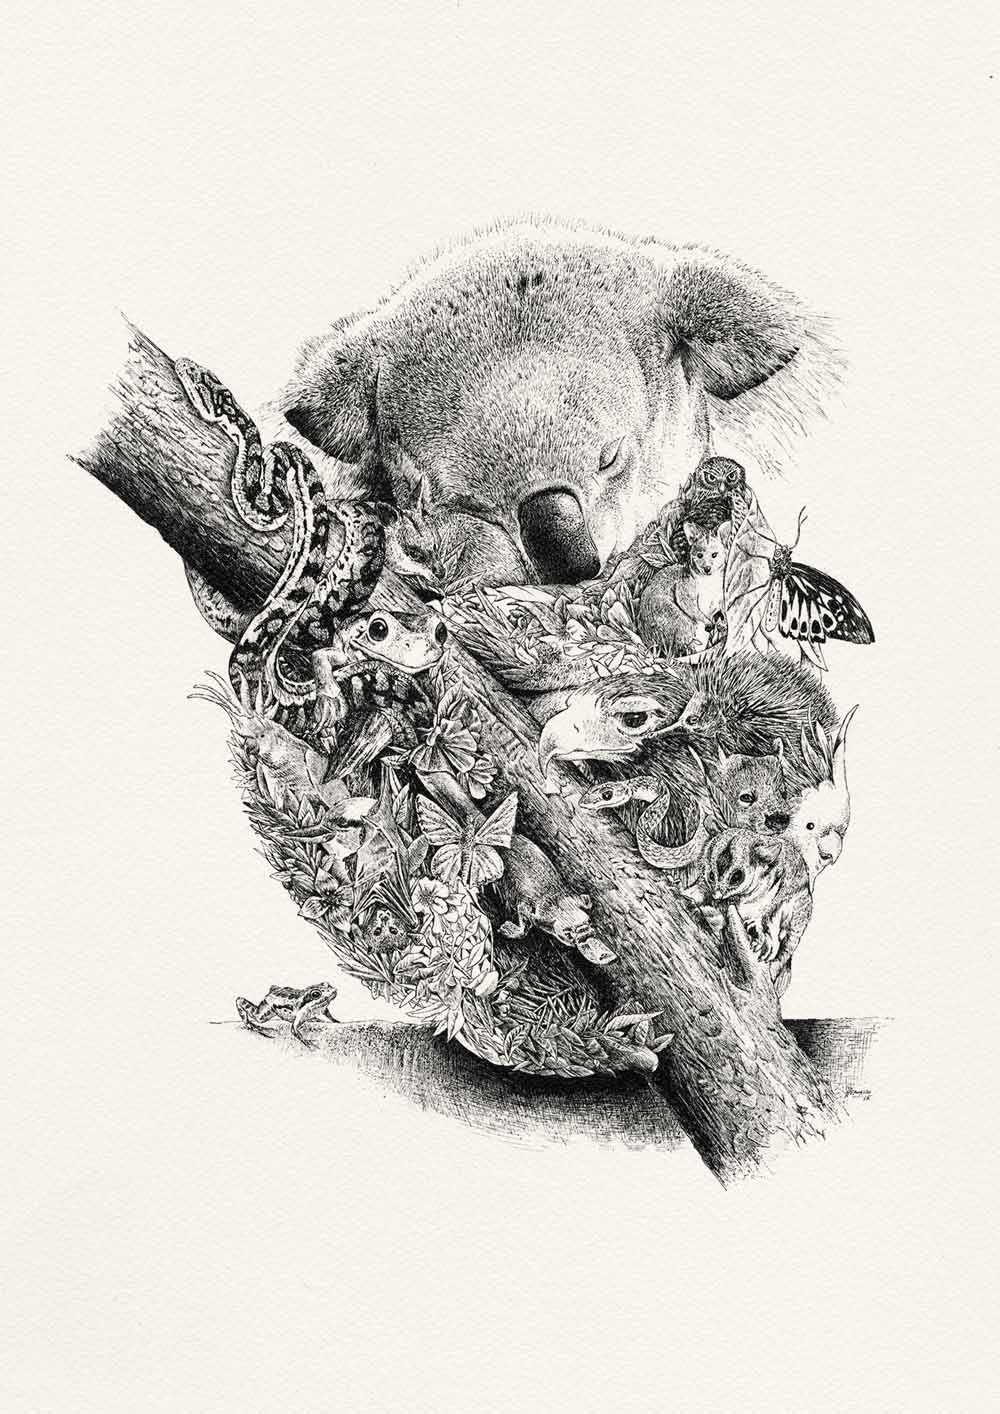 Koala Illustration by Nathan Ferlazzo